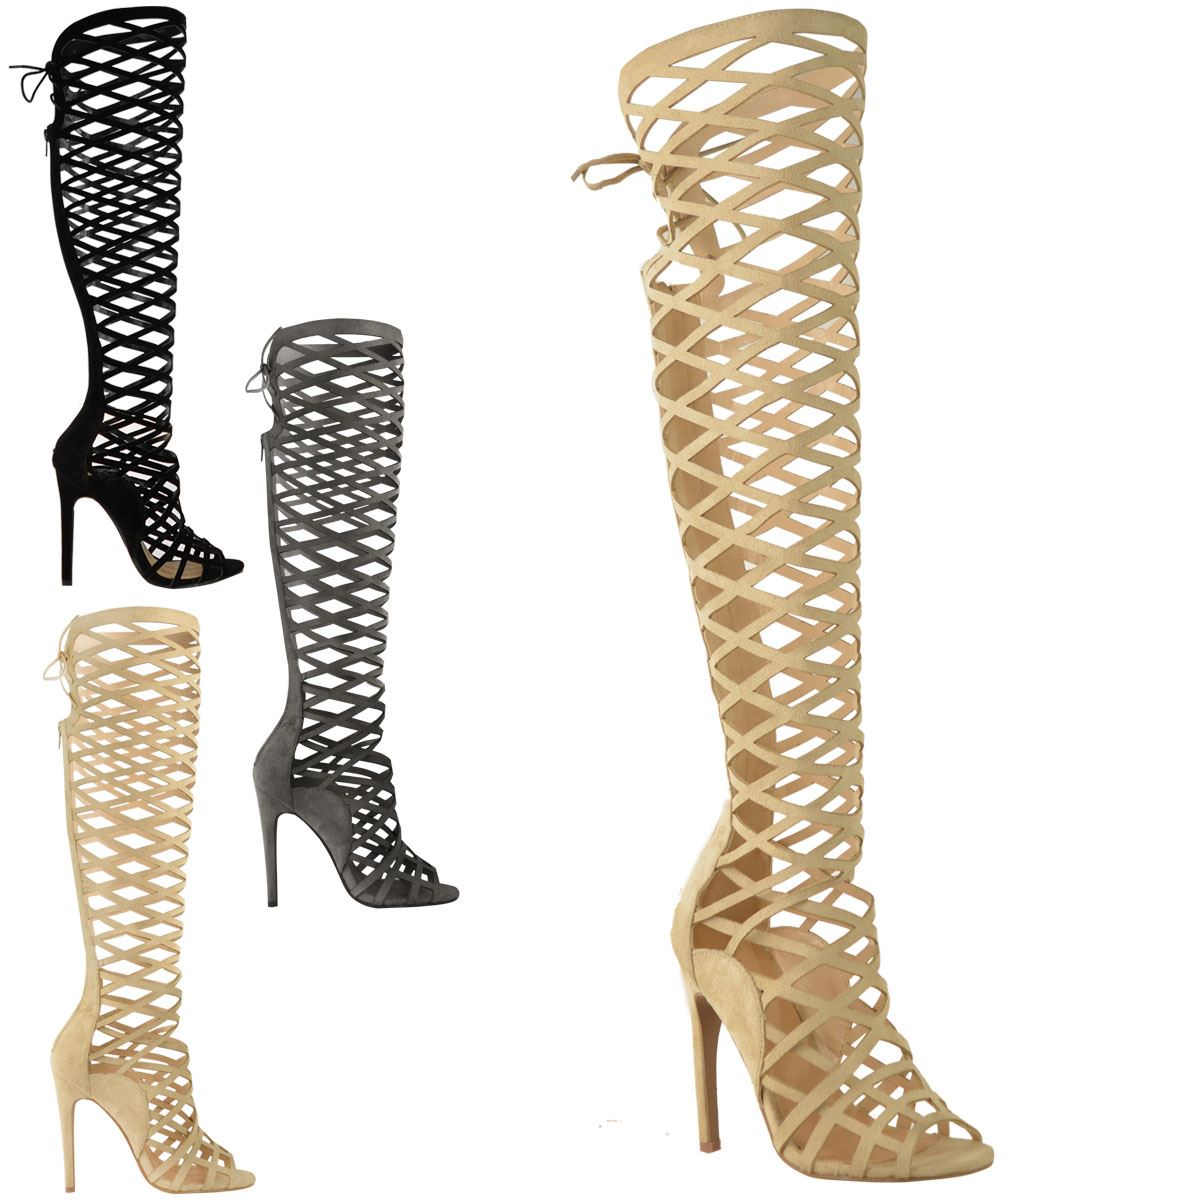 9b3123bd3ef3 Knee High Gladiator Sandals Singapore ~ Long Gladiator Sandals